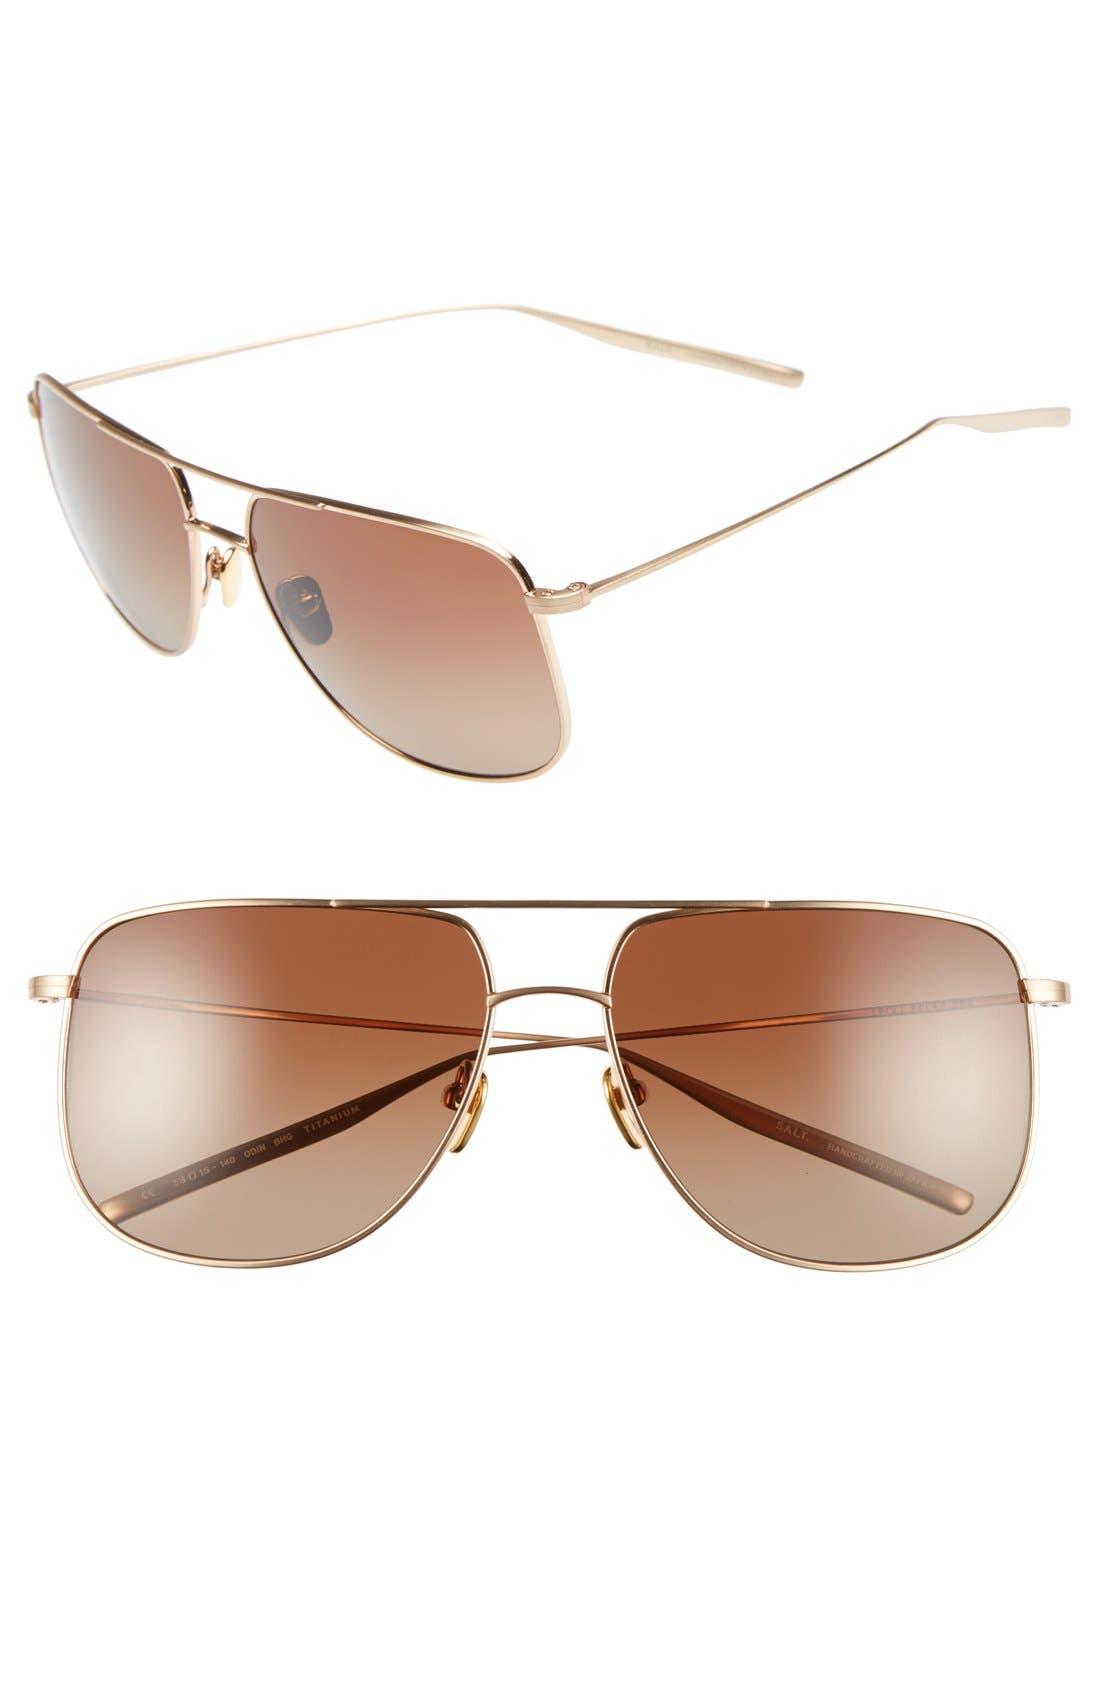 Alternate Image 1 Selected - SALT 'Odin' 58mm Polarized Sunglasses